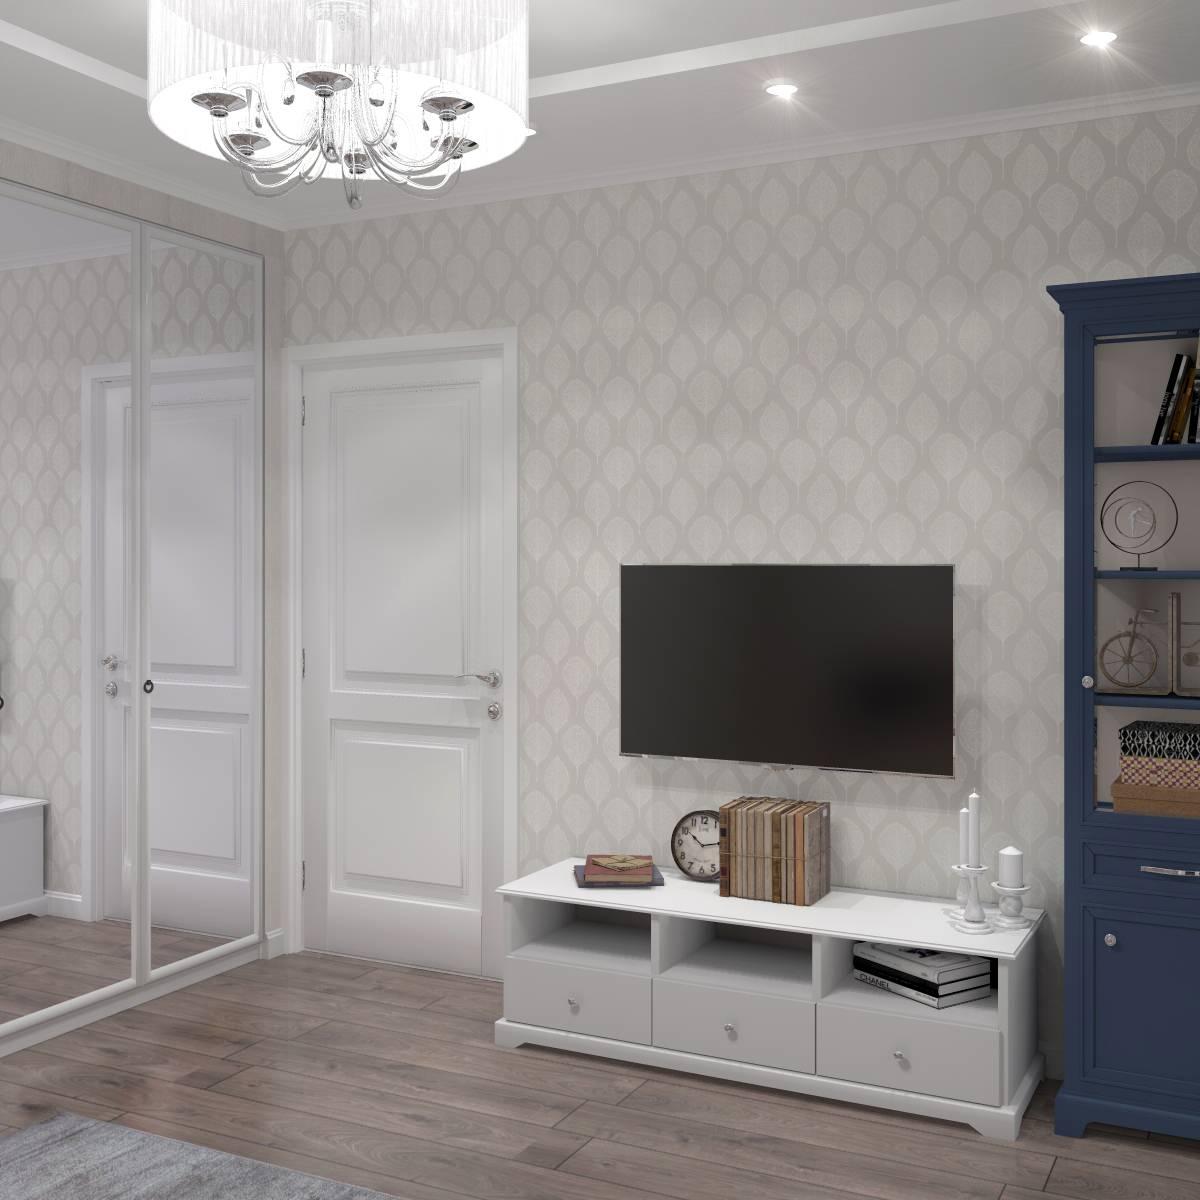 Проект квартиры г. Химки